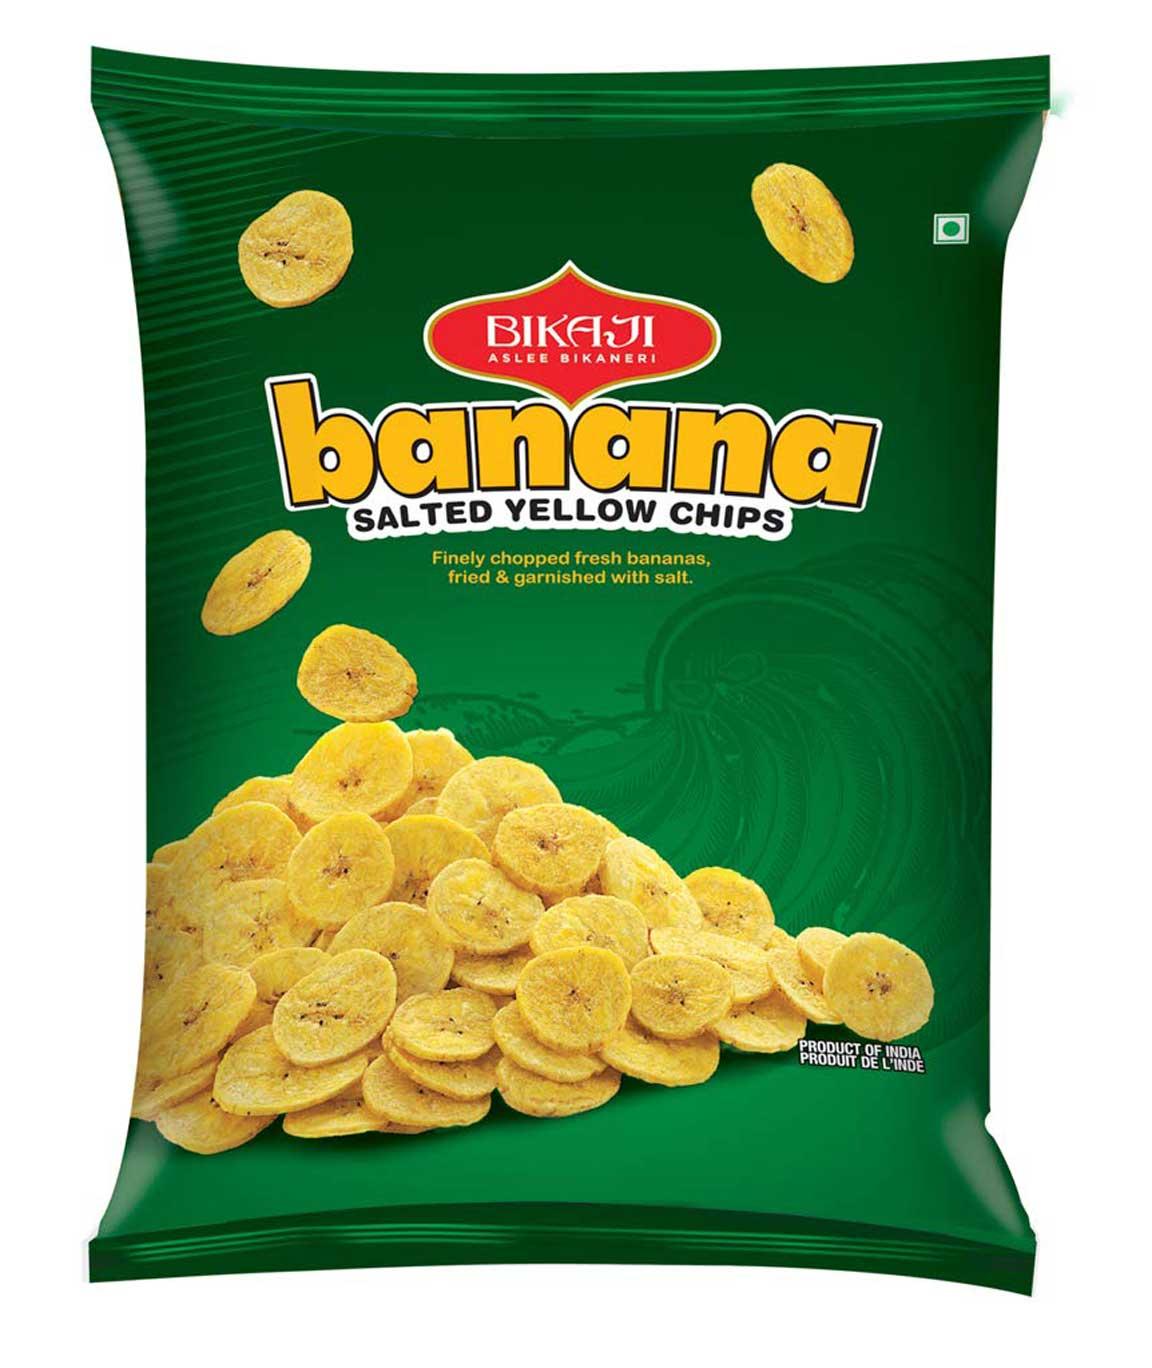 Bikaji Aslee Bikaneri - Yellow Banana Salted Chips 80g - 100% Vegetarian - Indian Namkeen Snack - Pack of 3